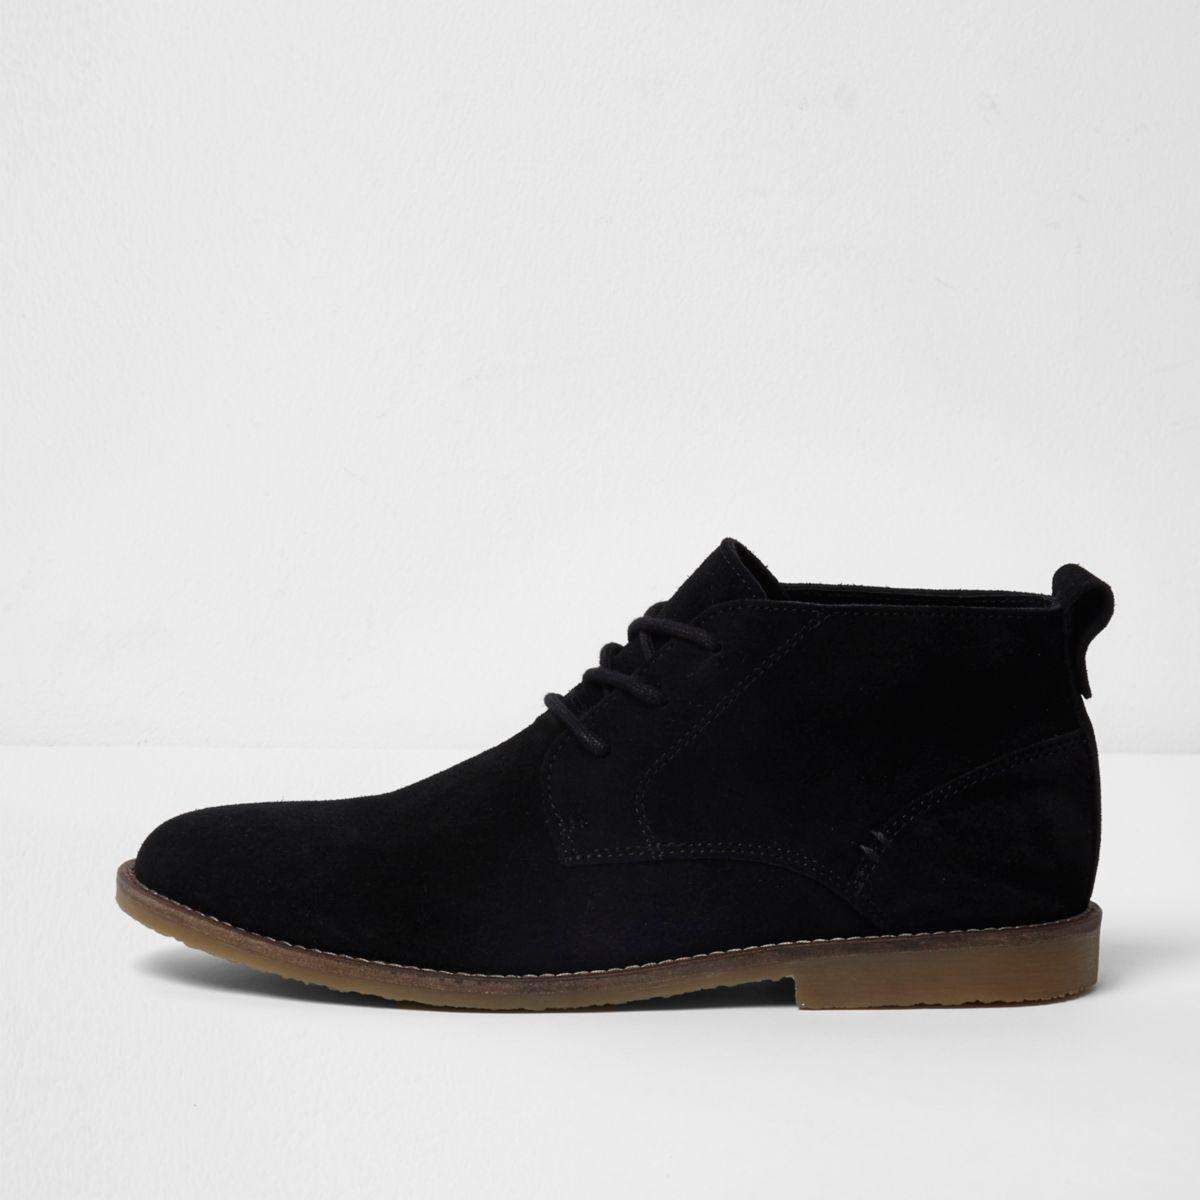 Black wide fit suede desert boots